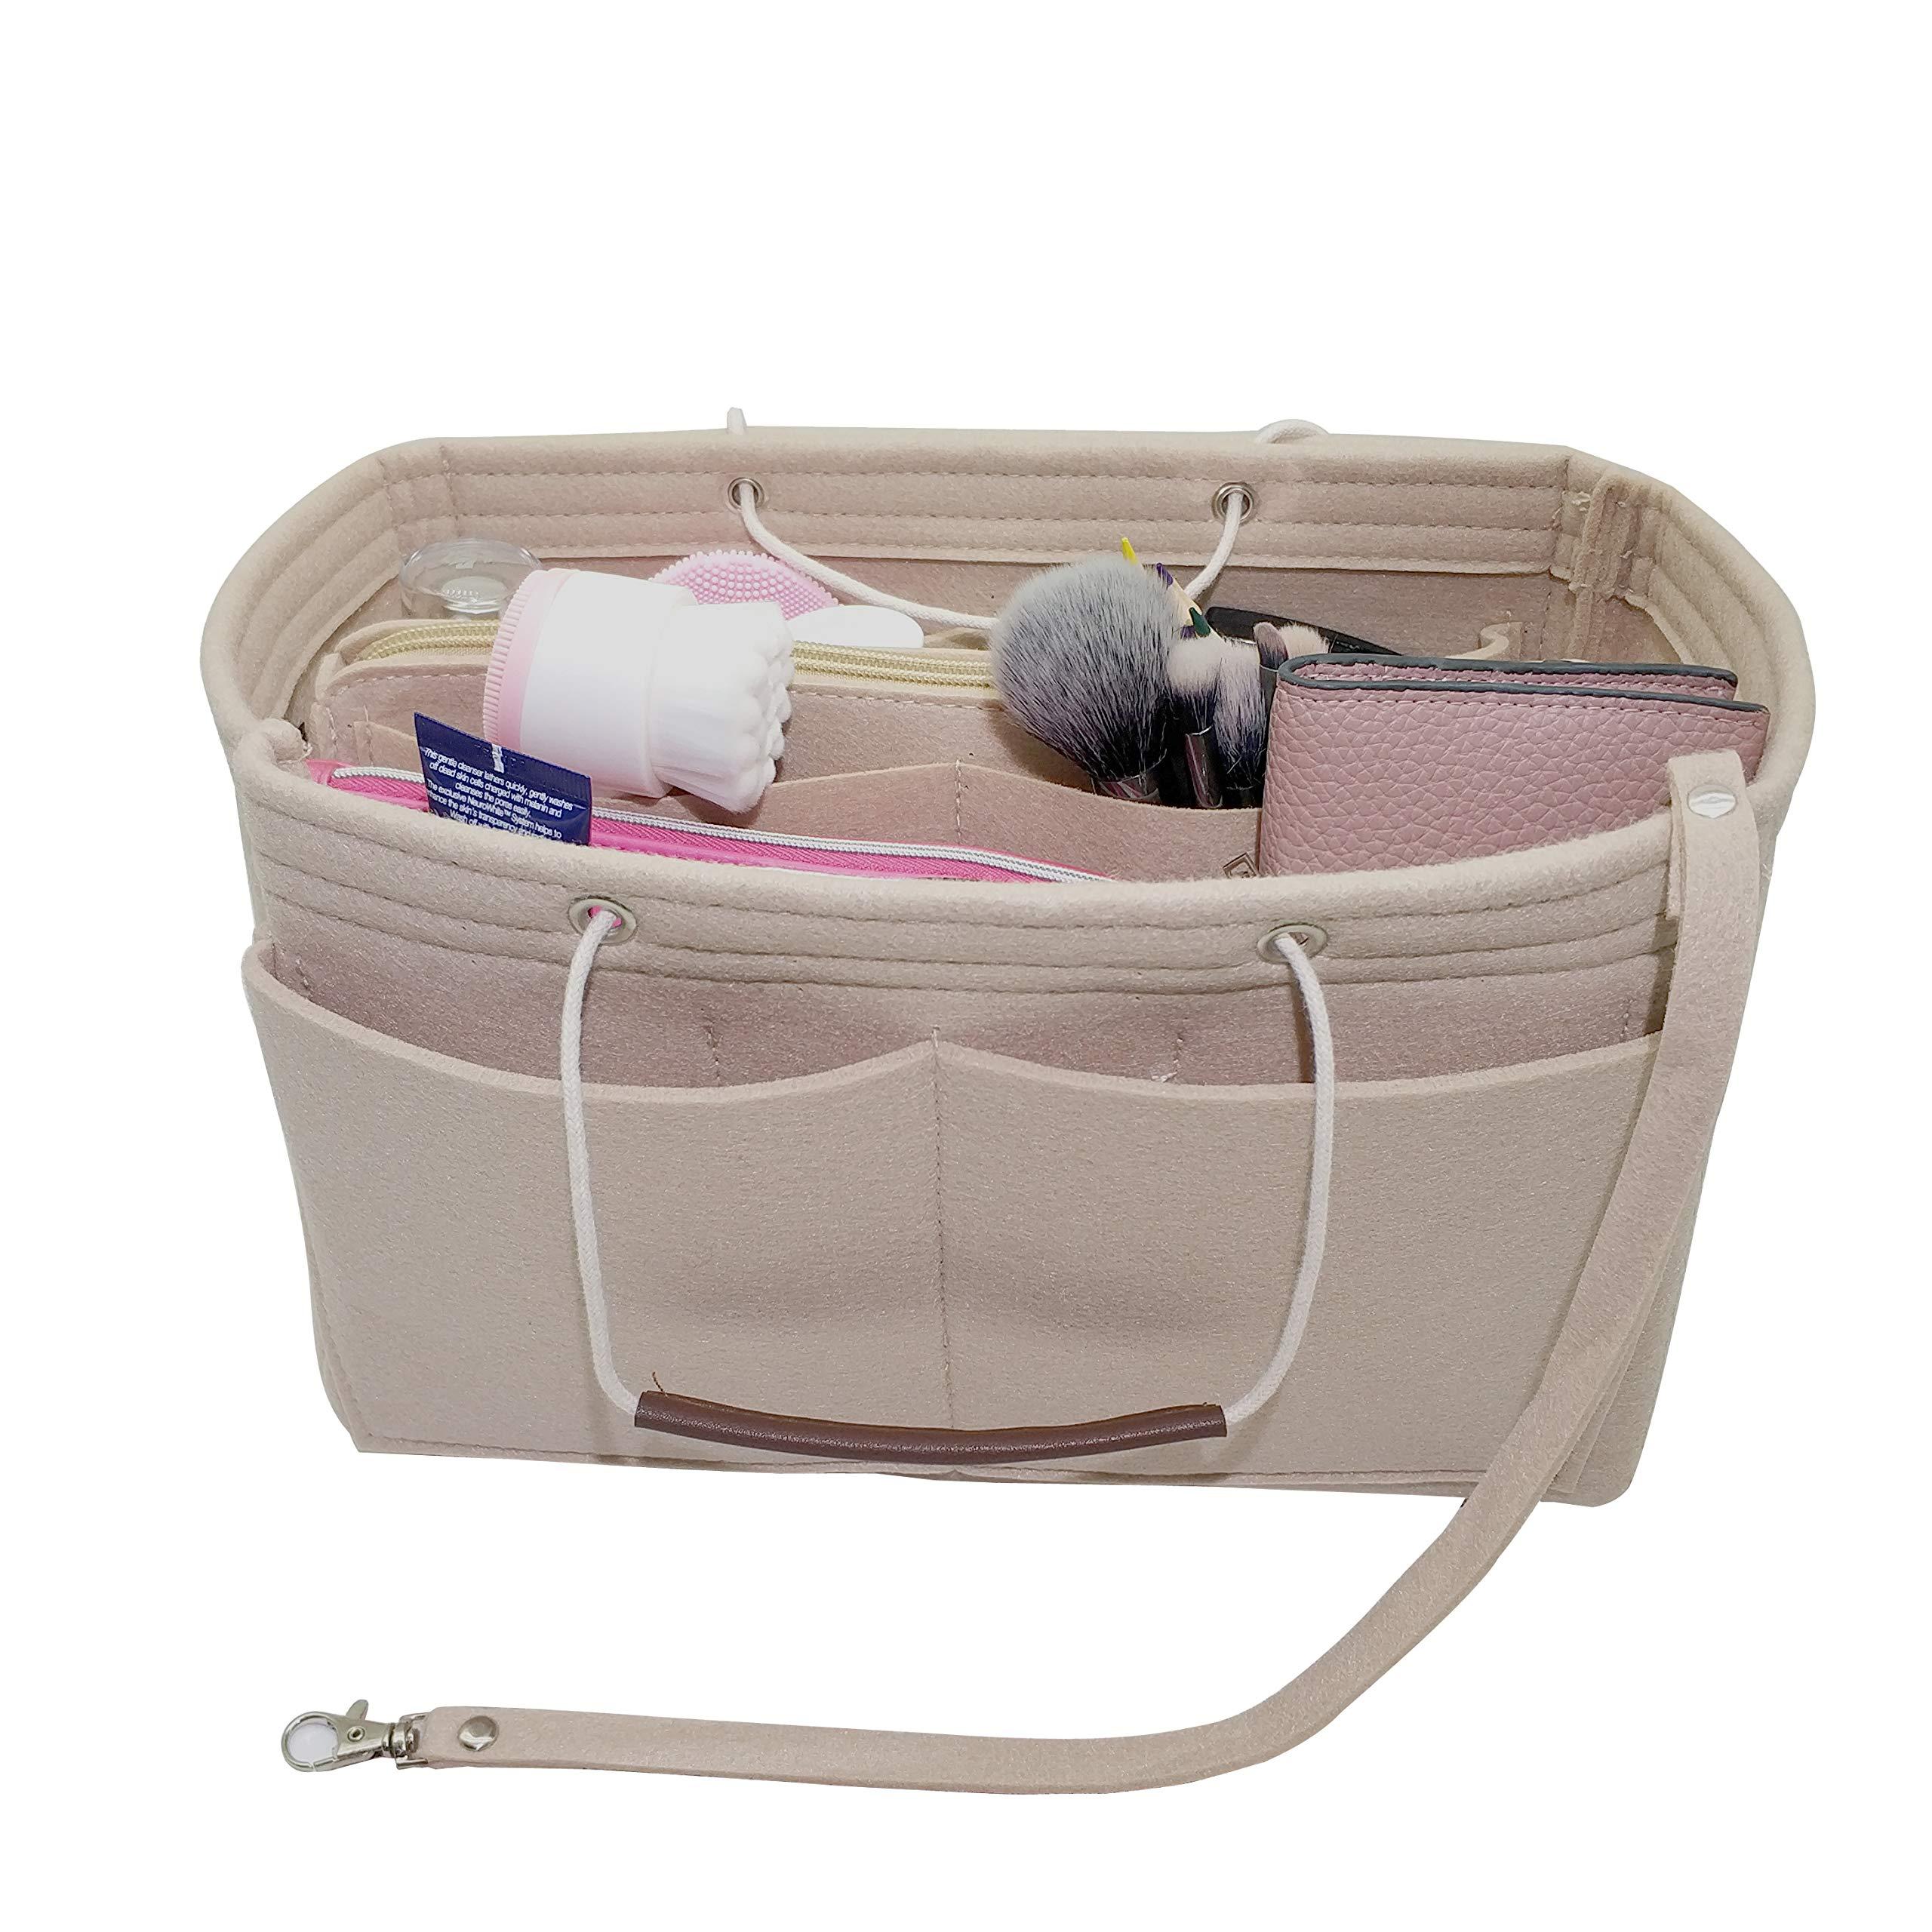 LEXSION Felt Purse Insert Handbag Organizer Bag in Bag Organizer with HandlesHolder Beige Large